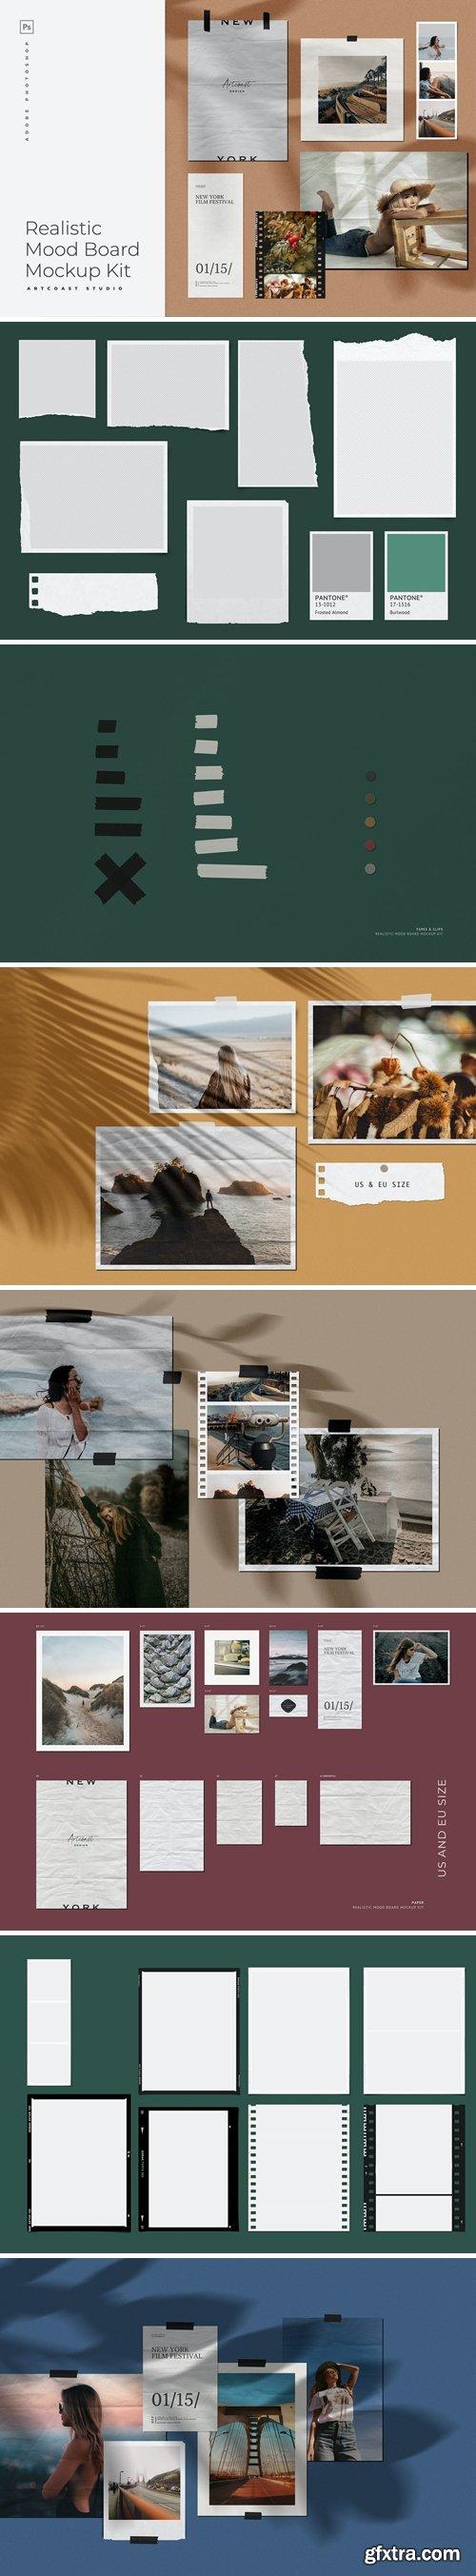 CreativeMarket - Realistic Moodboard Mockup Kit 5617960